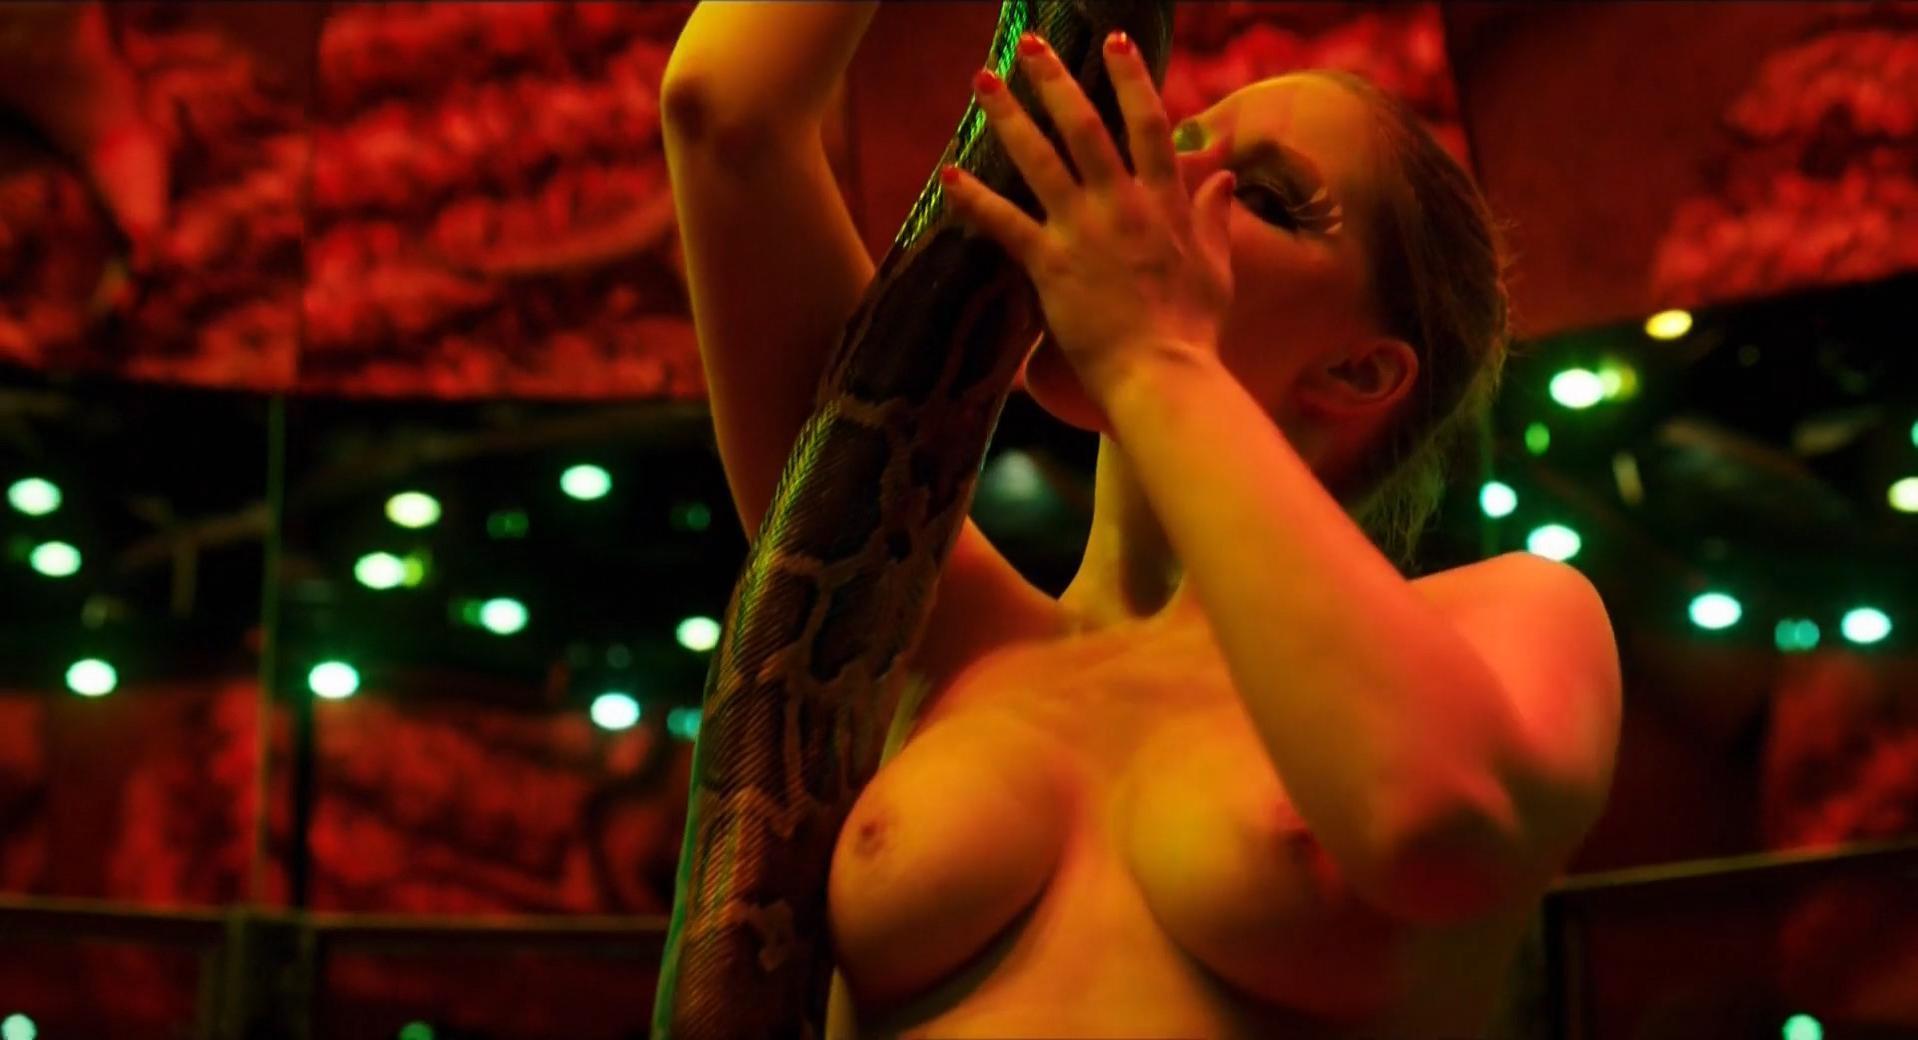 Nude Video Celebs Anna Maria Hirsch Nude Tod Den Hippies Es